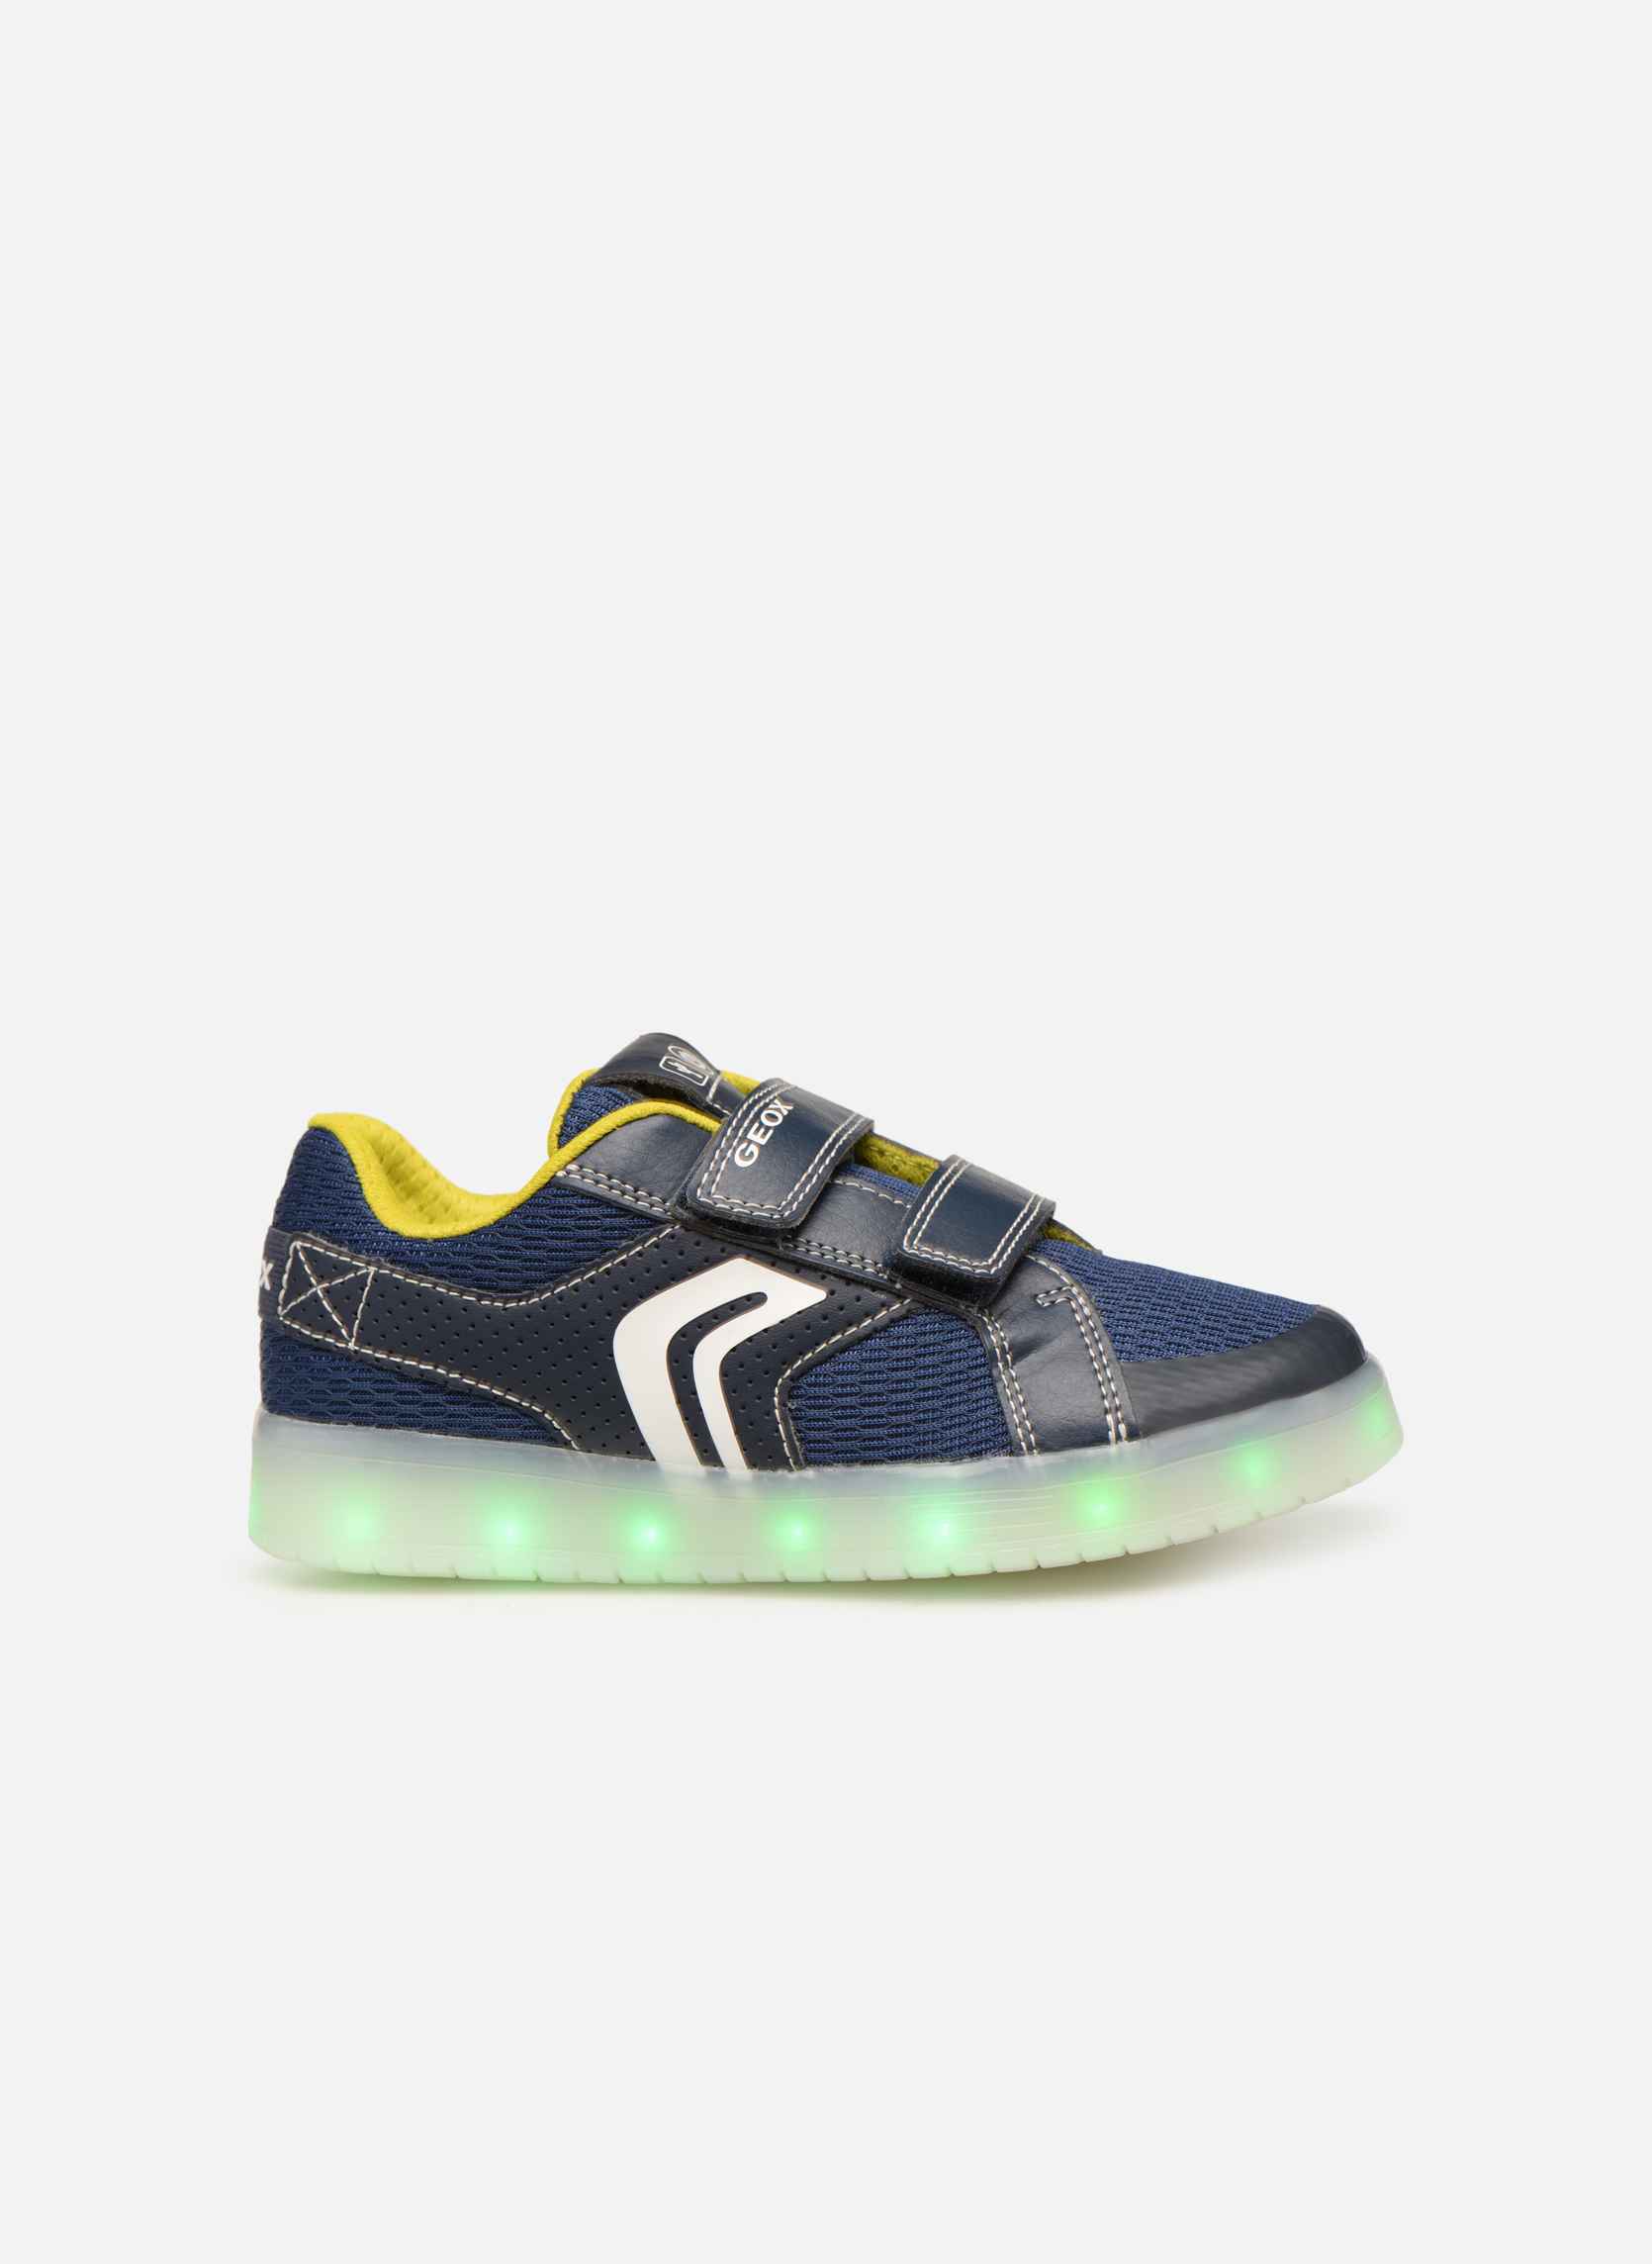 abf9a3eb3 Zapatos niños online  calzado niños